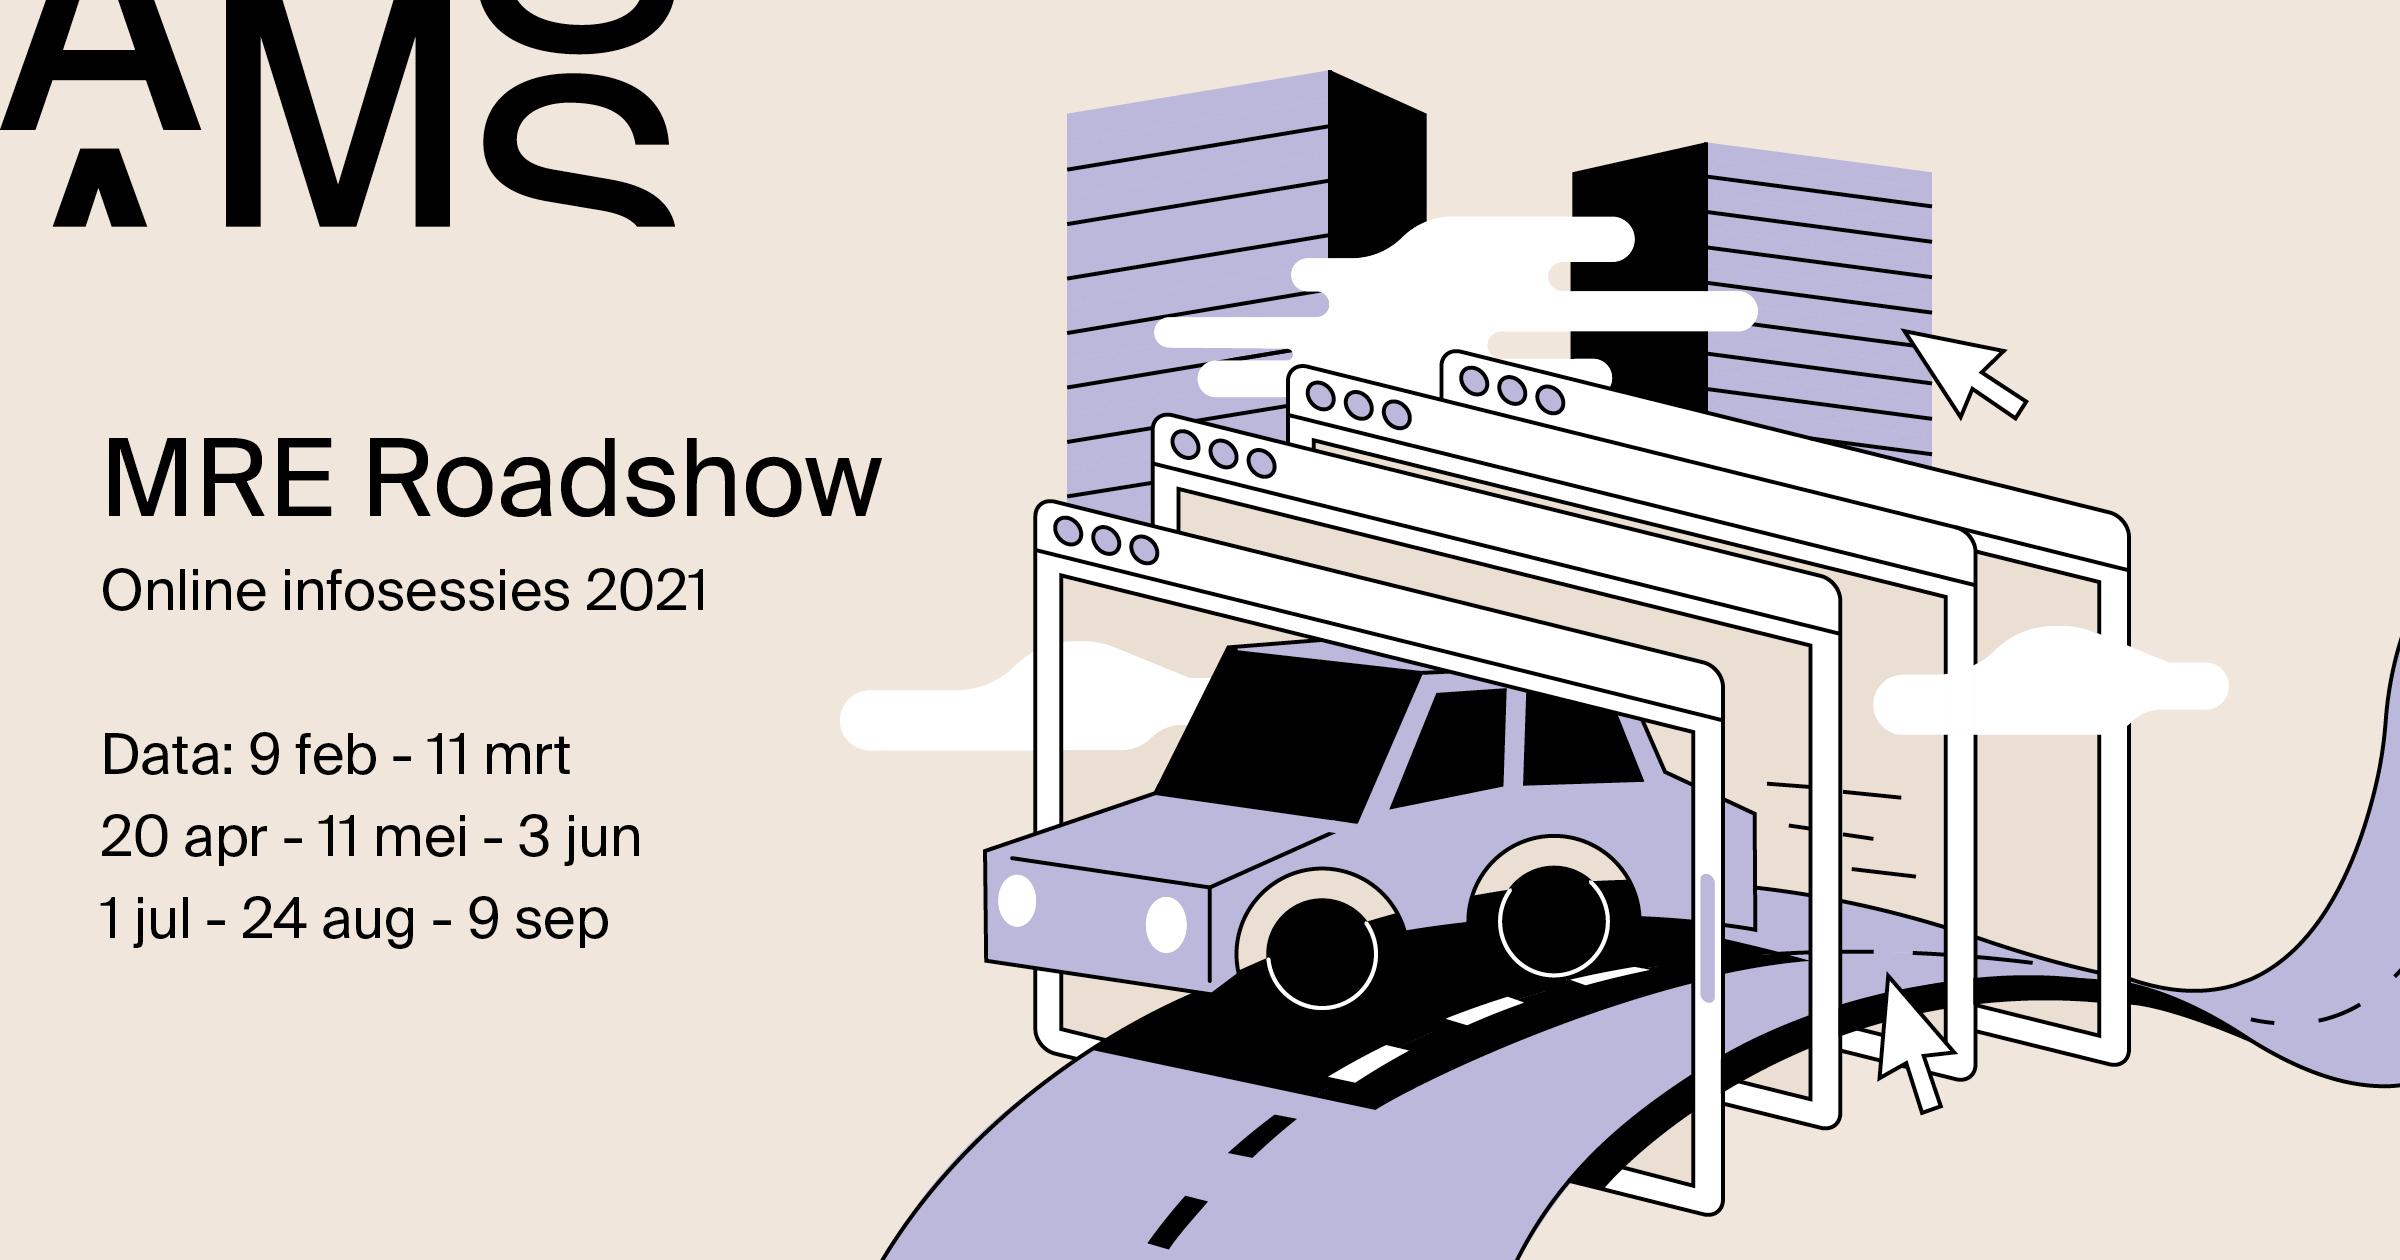 AMS_MRE_banner_Roadshow_2021